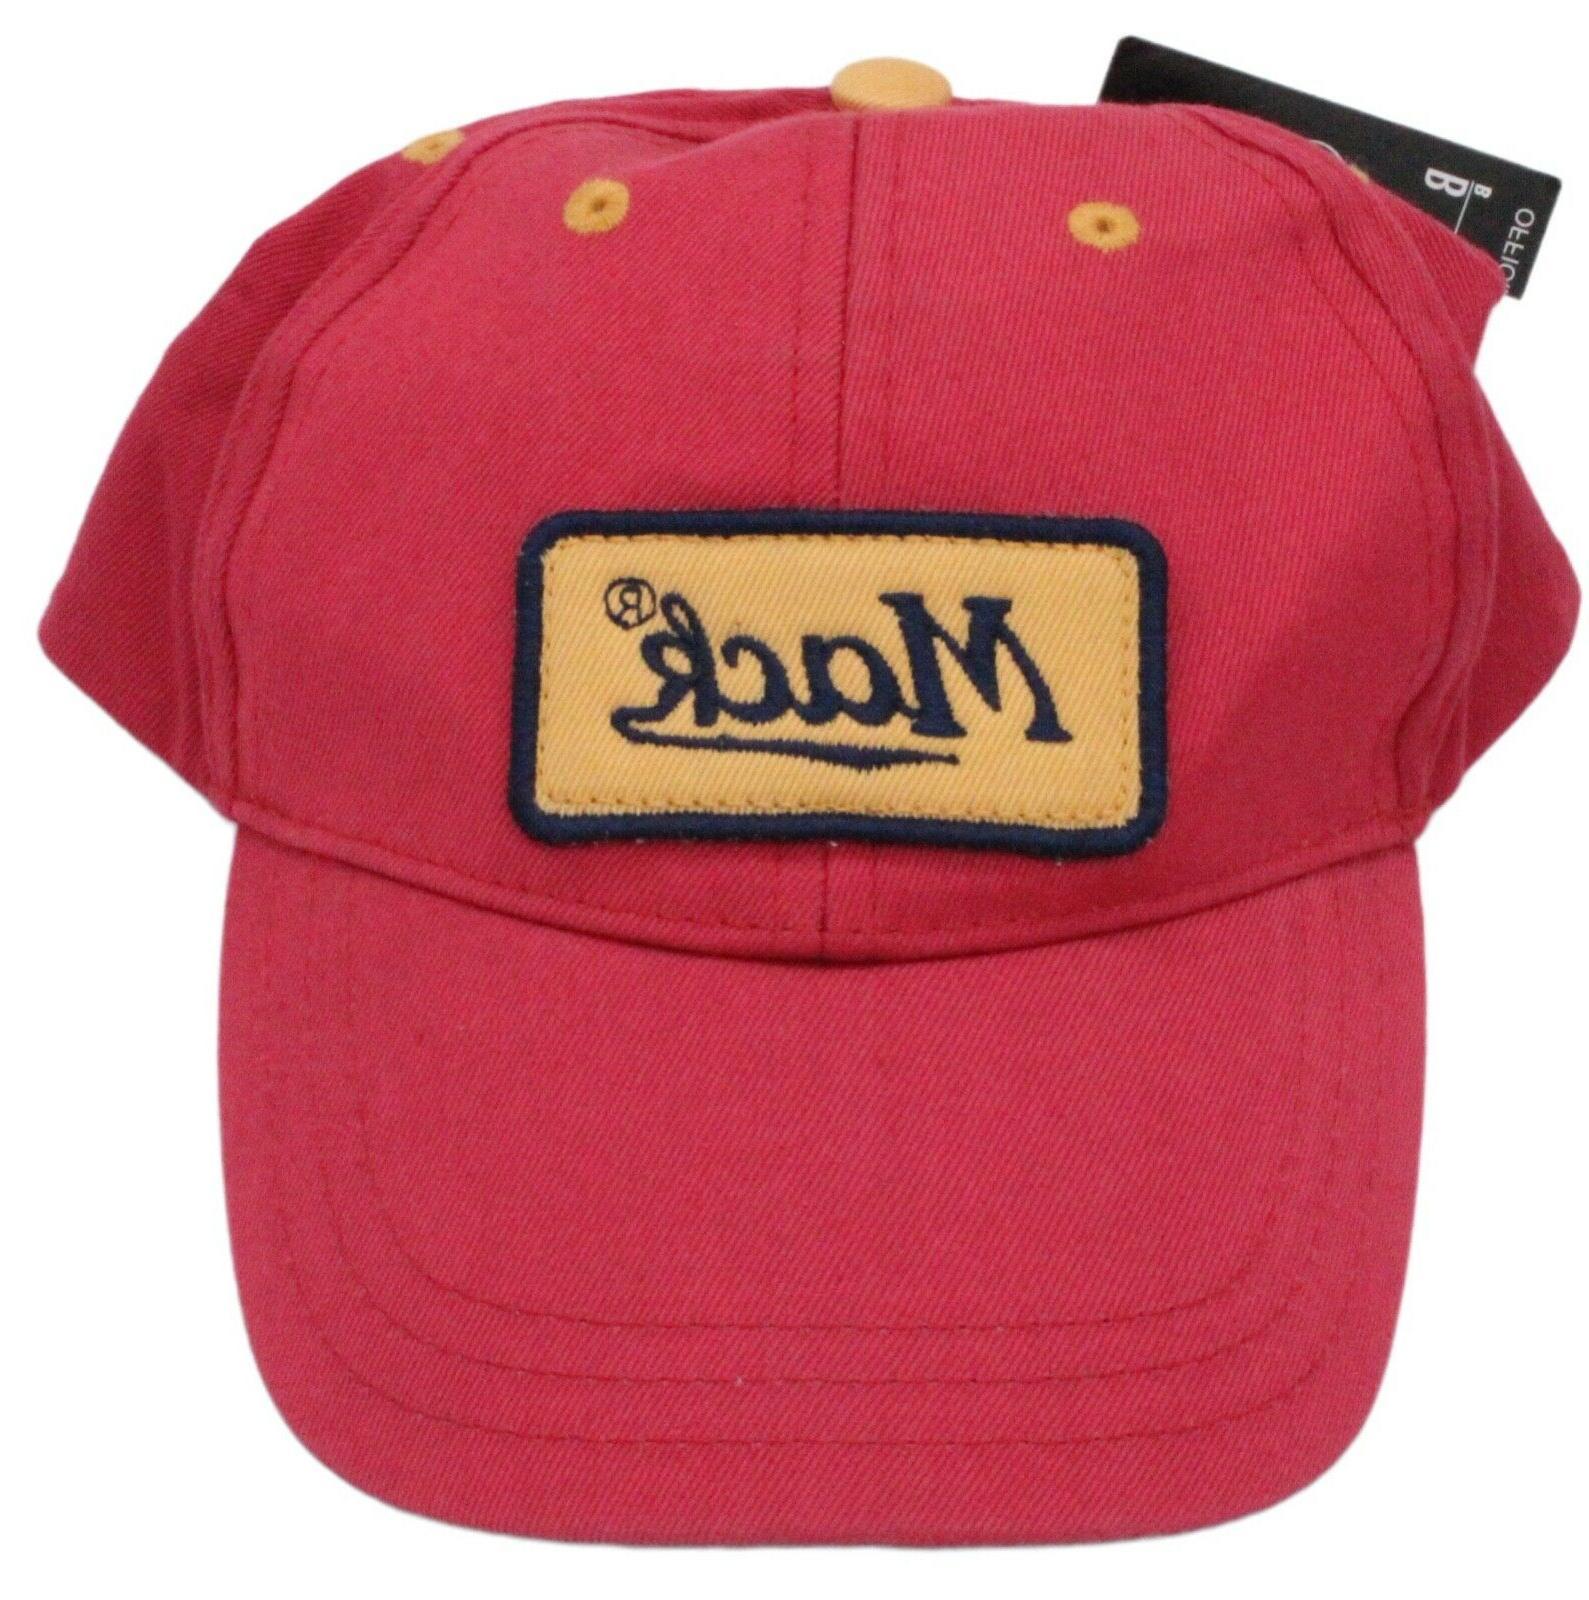 mack trucker hat 2t 3t toddler cap